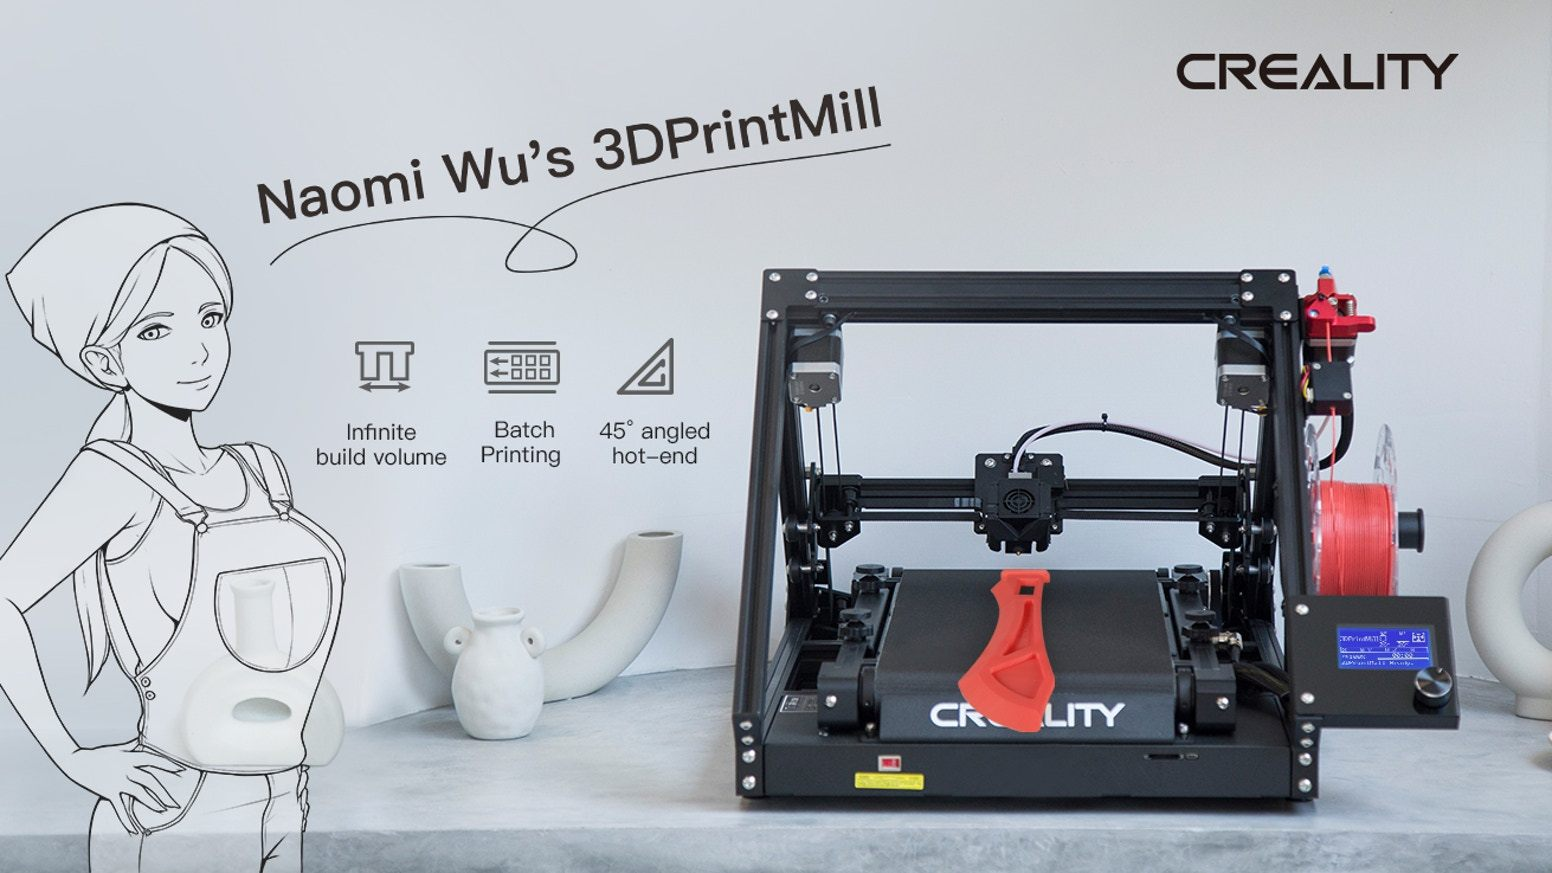 3DPrintMill/CR 30, Infinite-Z Belt 3D Printer - Creality 3D Printer